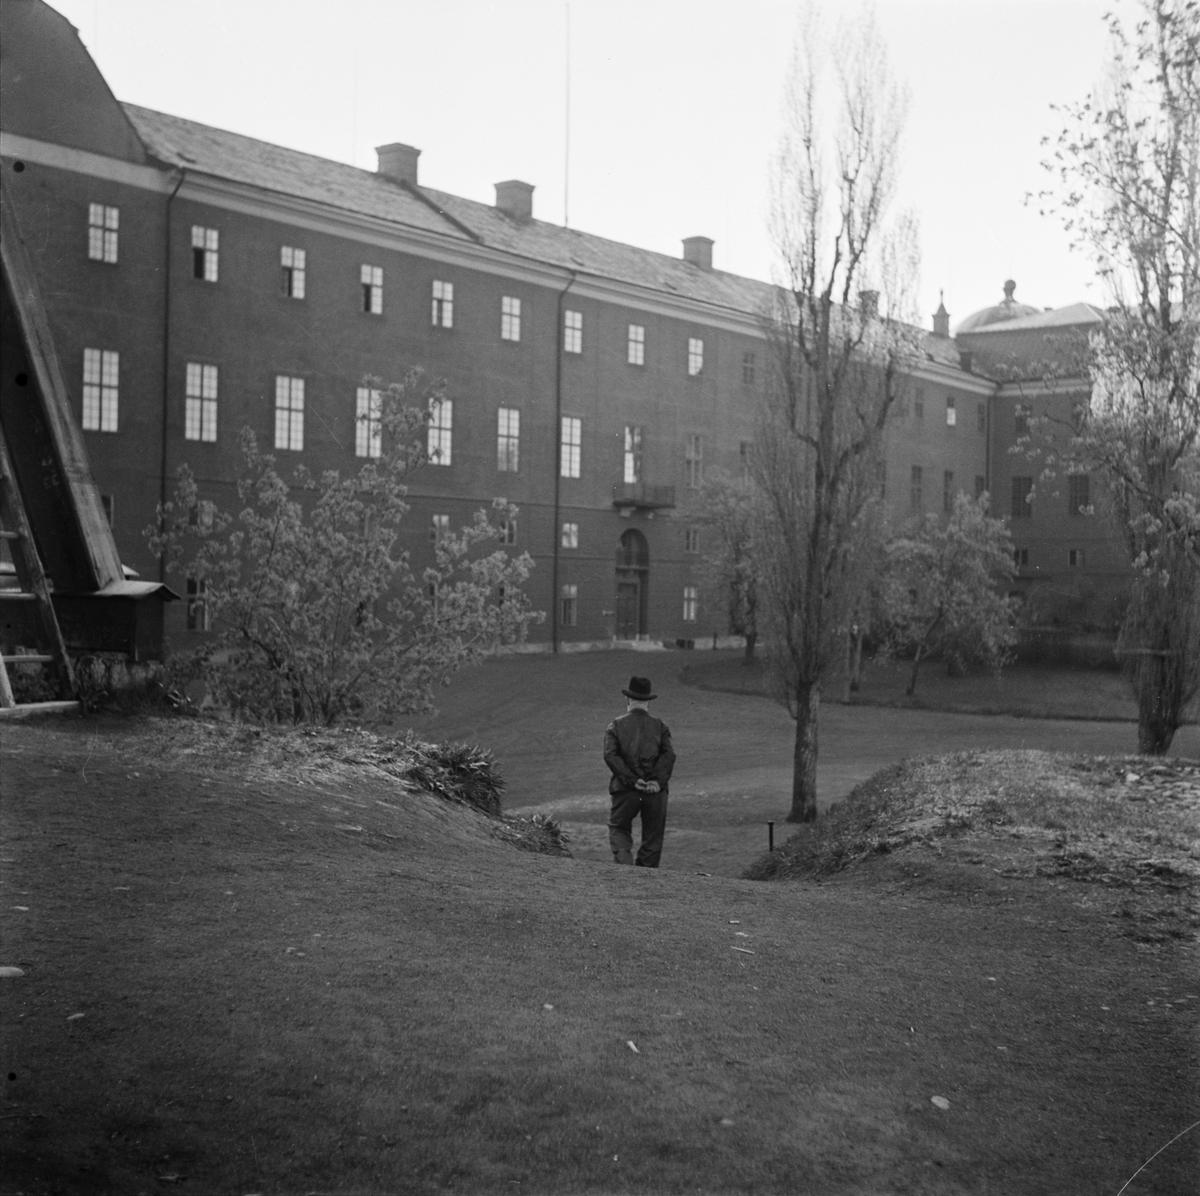 Uppsala slott, Slottsbacken, Uppsala